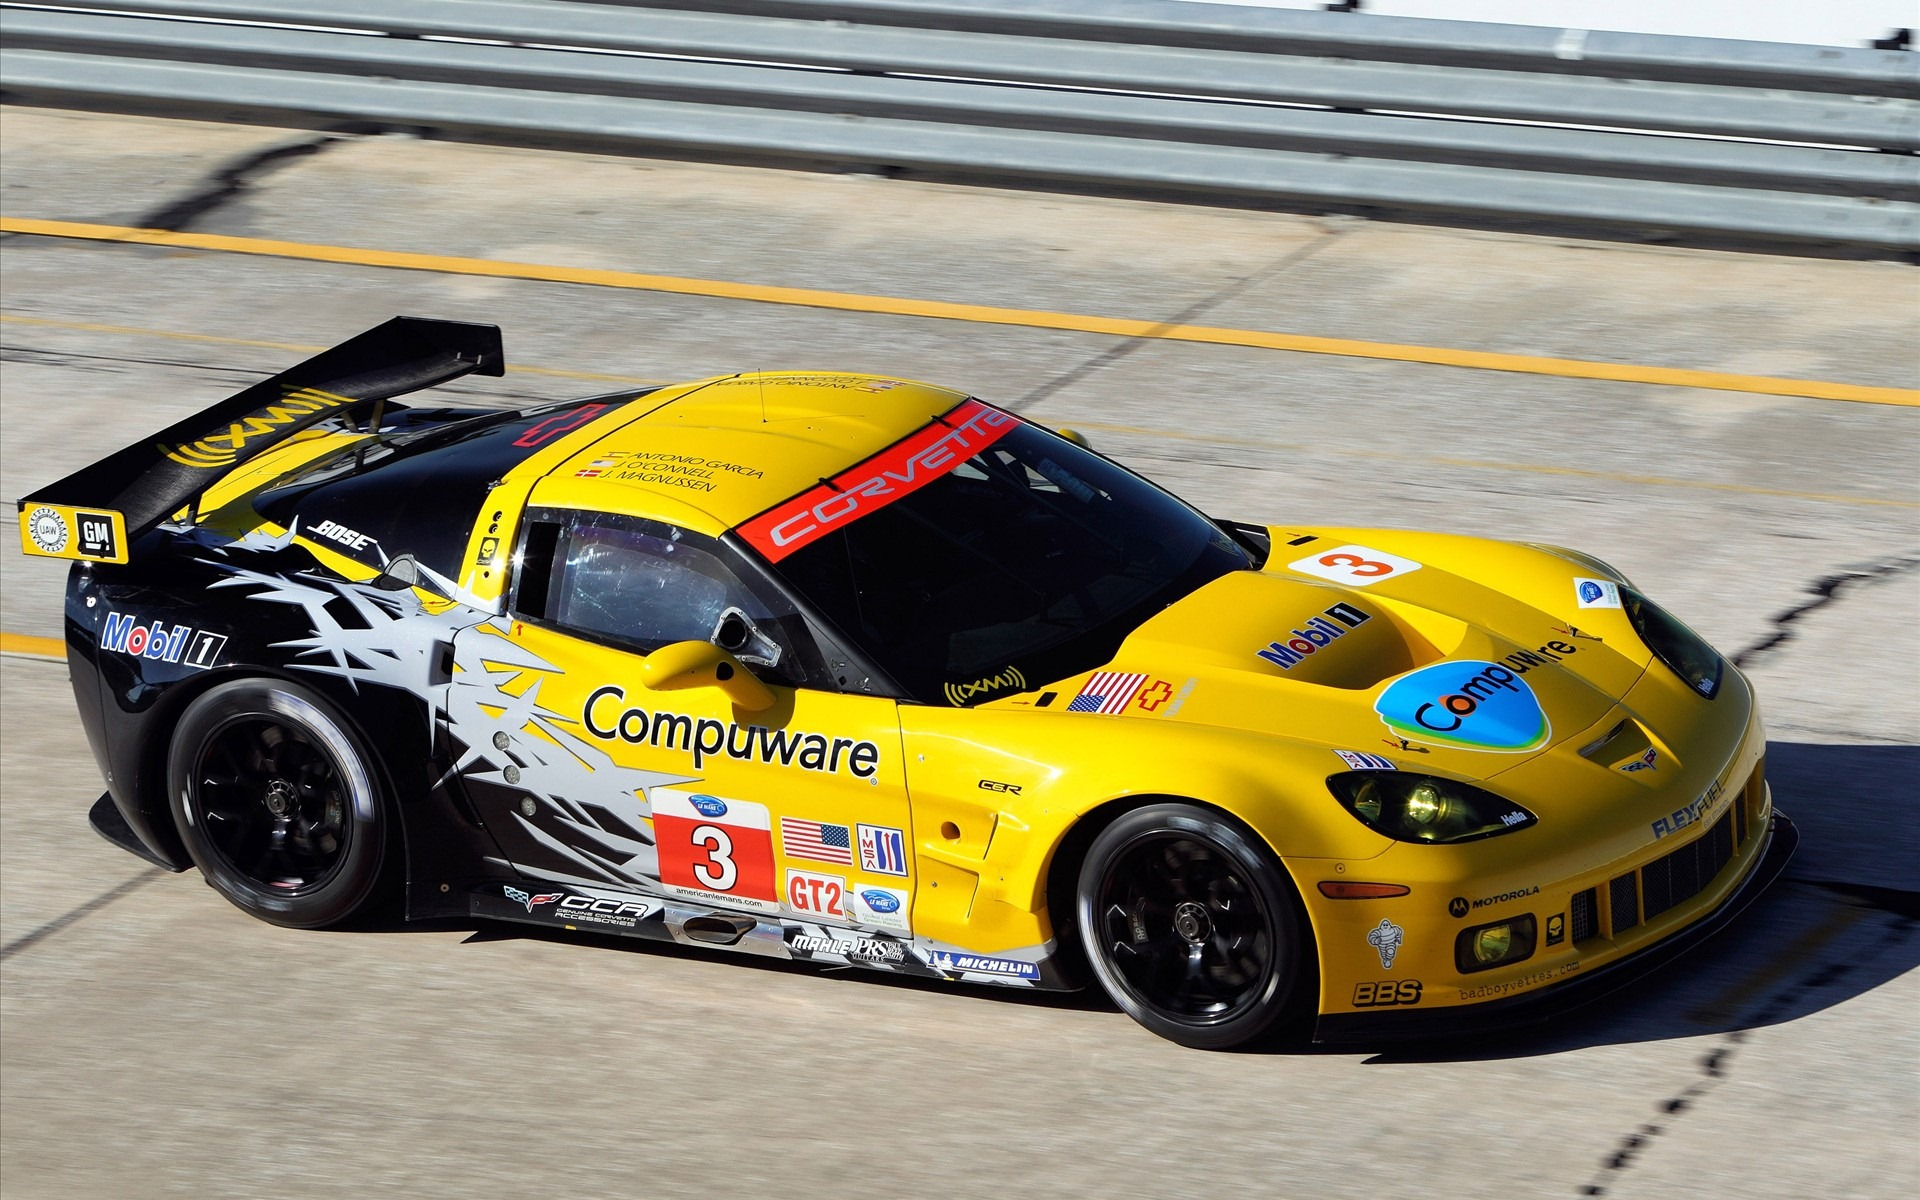 Corvette Racing Sebring 2010 wallpapers 19201200 Hot Cars Zone 1920x1200